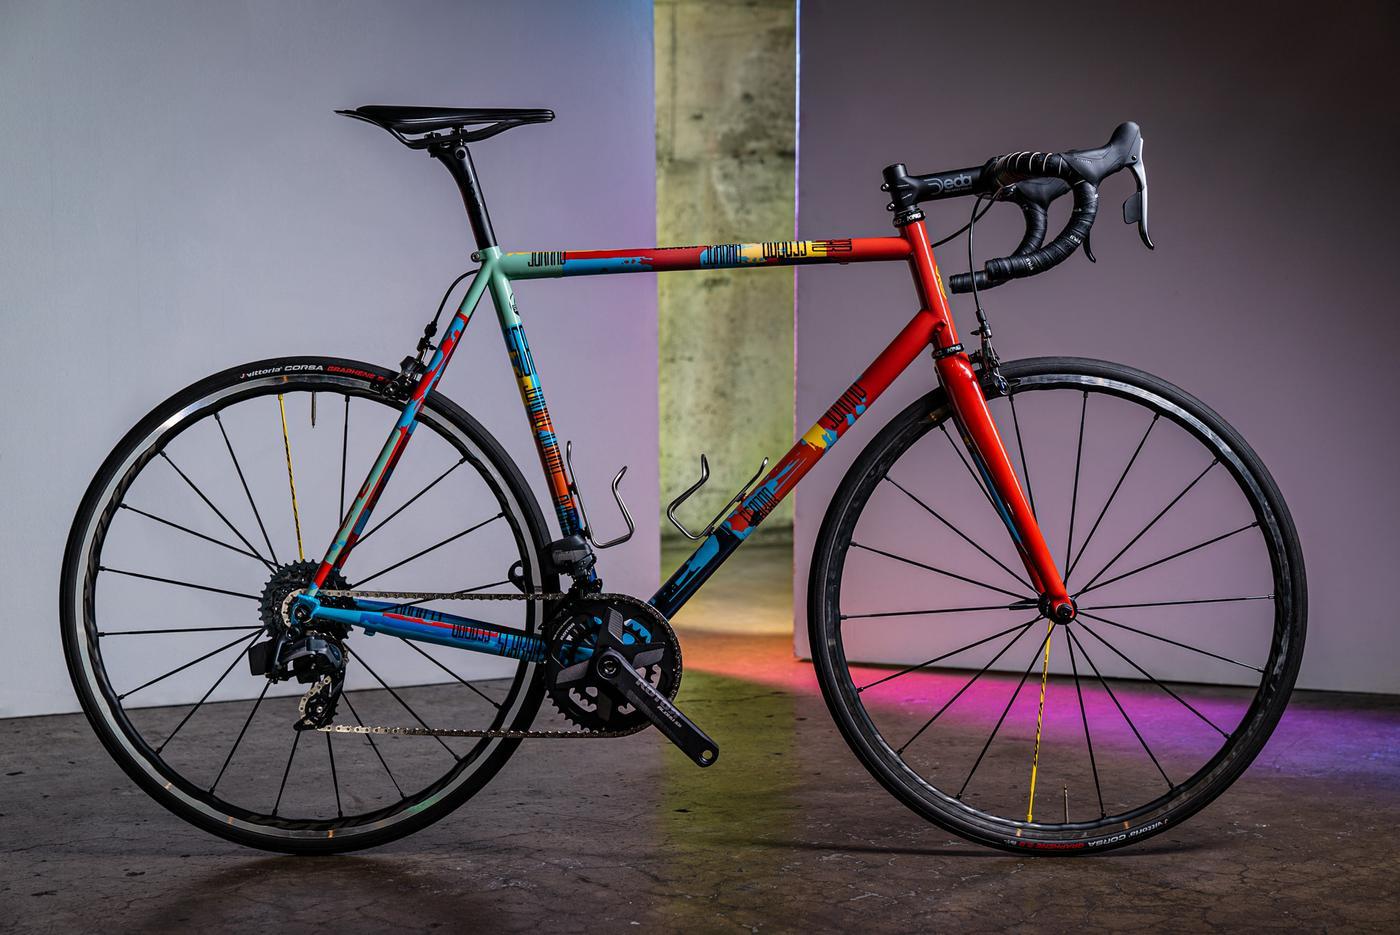 Scarab Cycles' RAUCH Santa Rosa Road Bike Is Based on the Work of Richard Diebenkorn